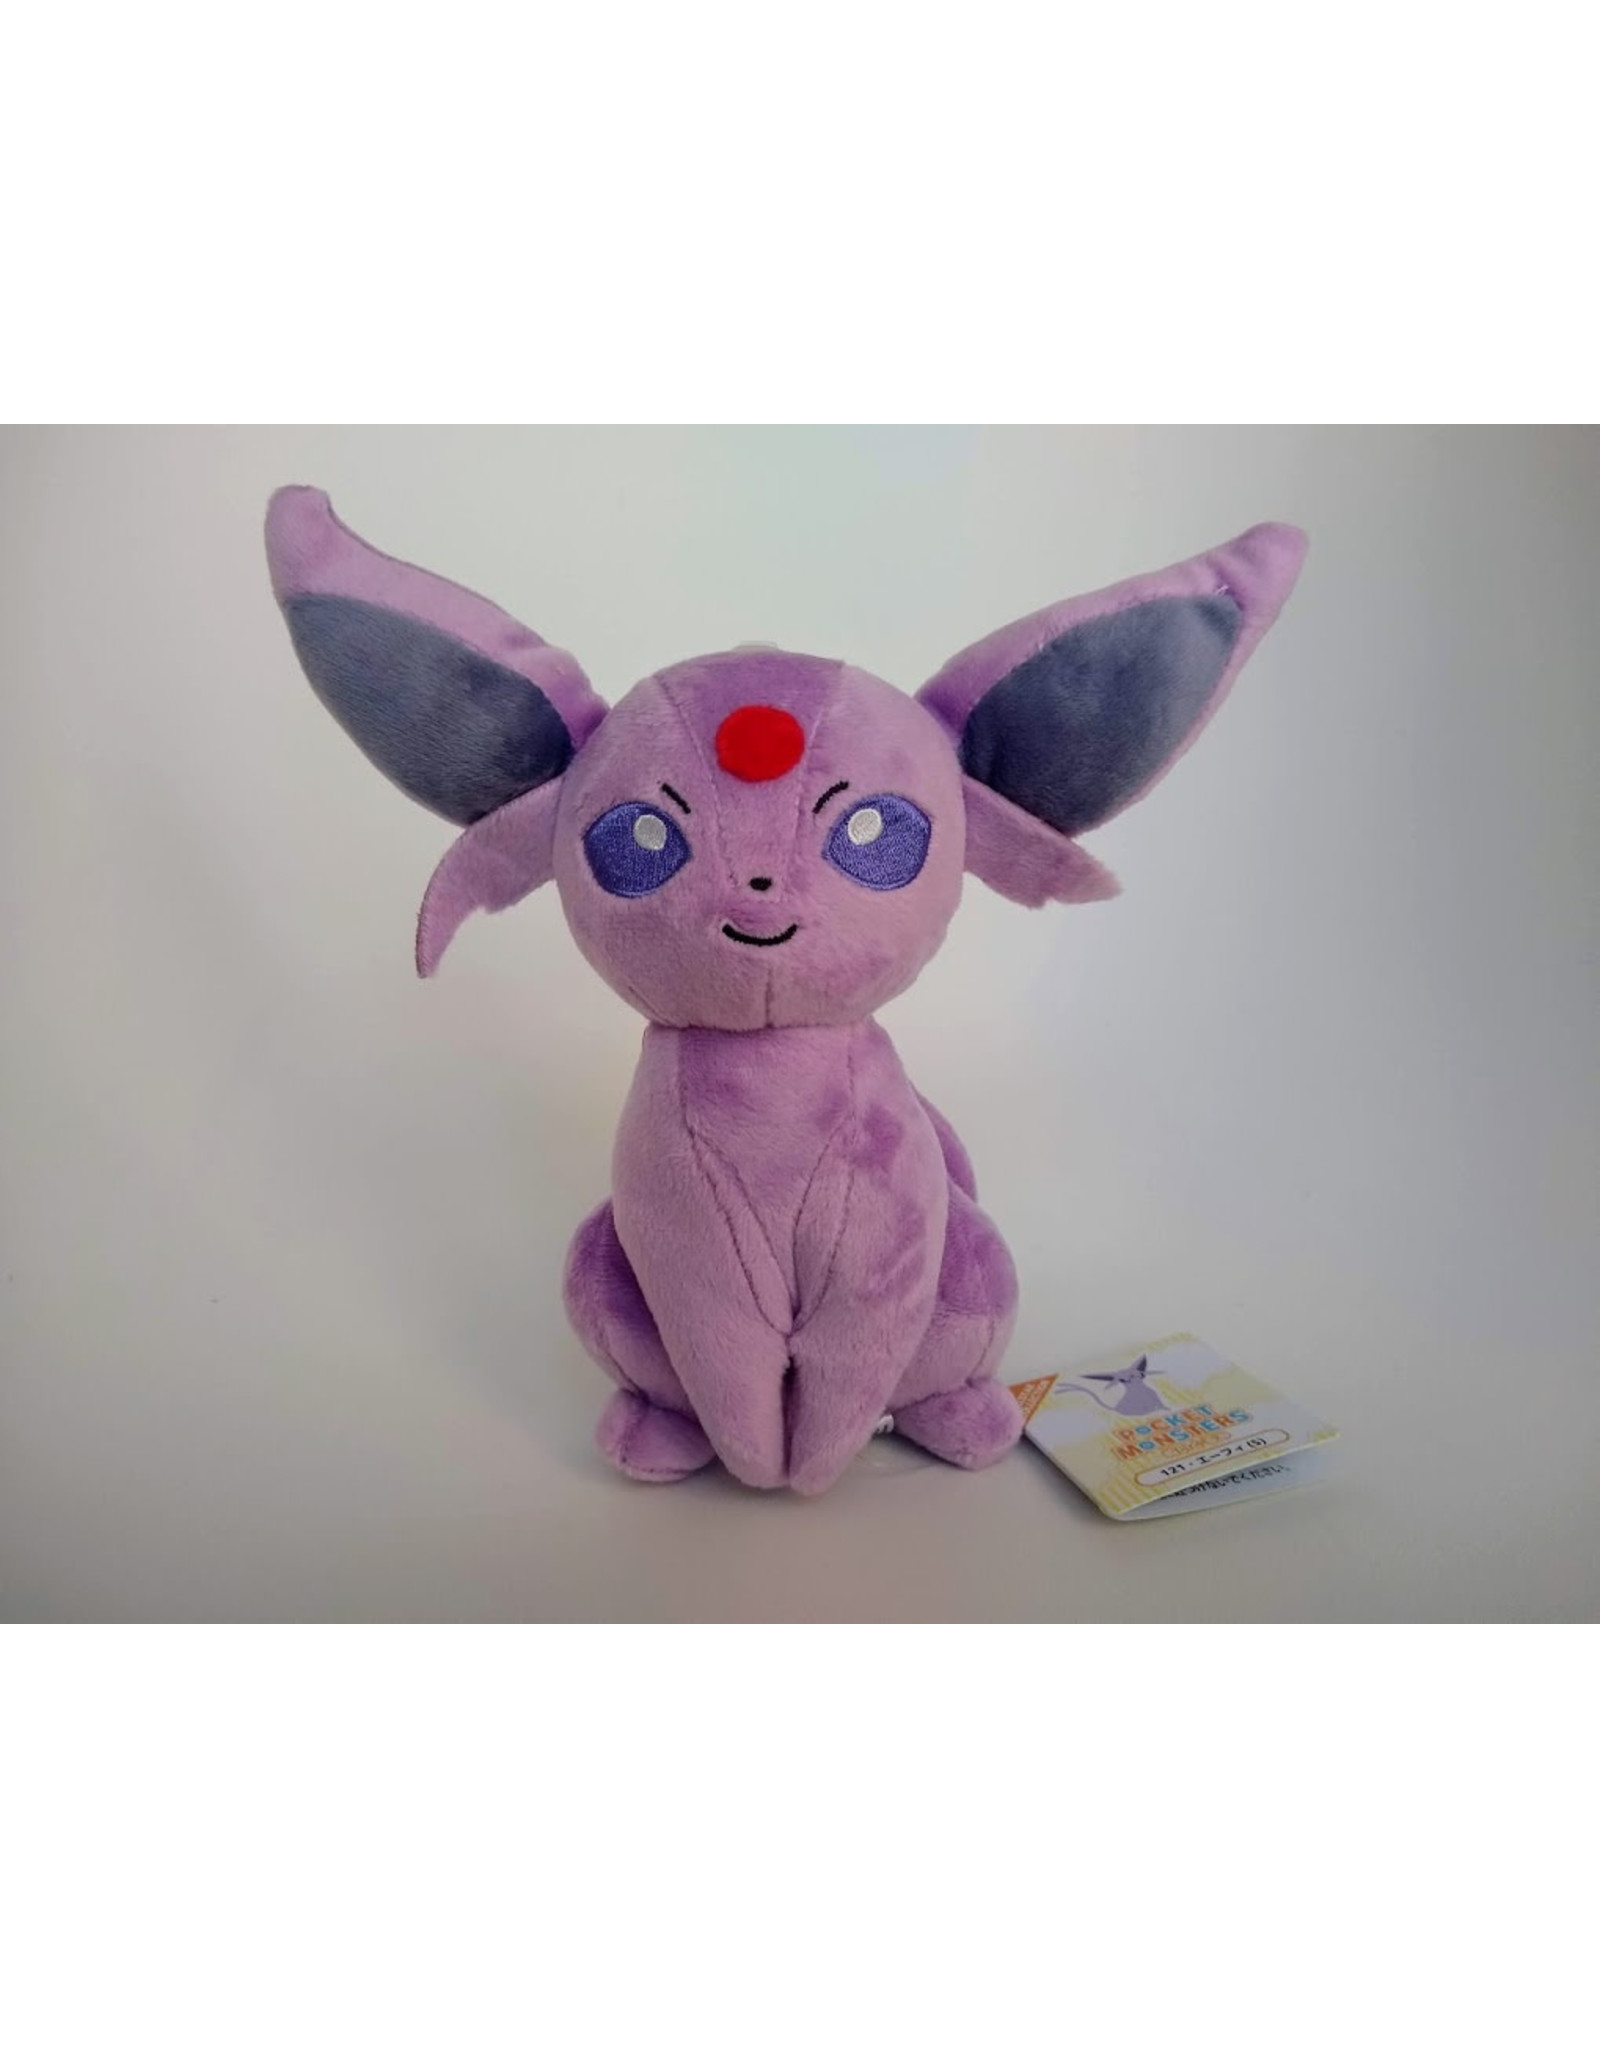 Espeon - Pokemon Plushie - 20cm (Japanese import)